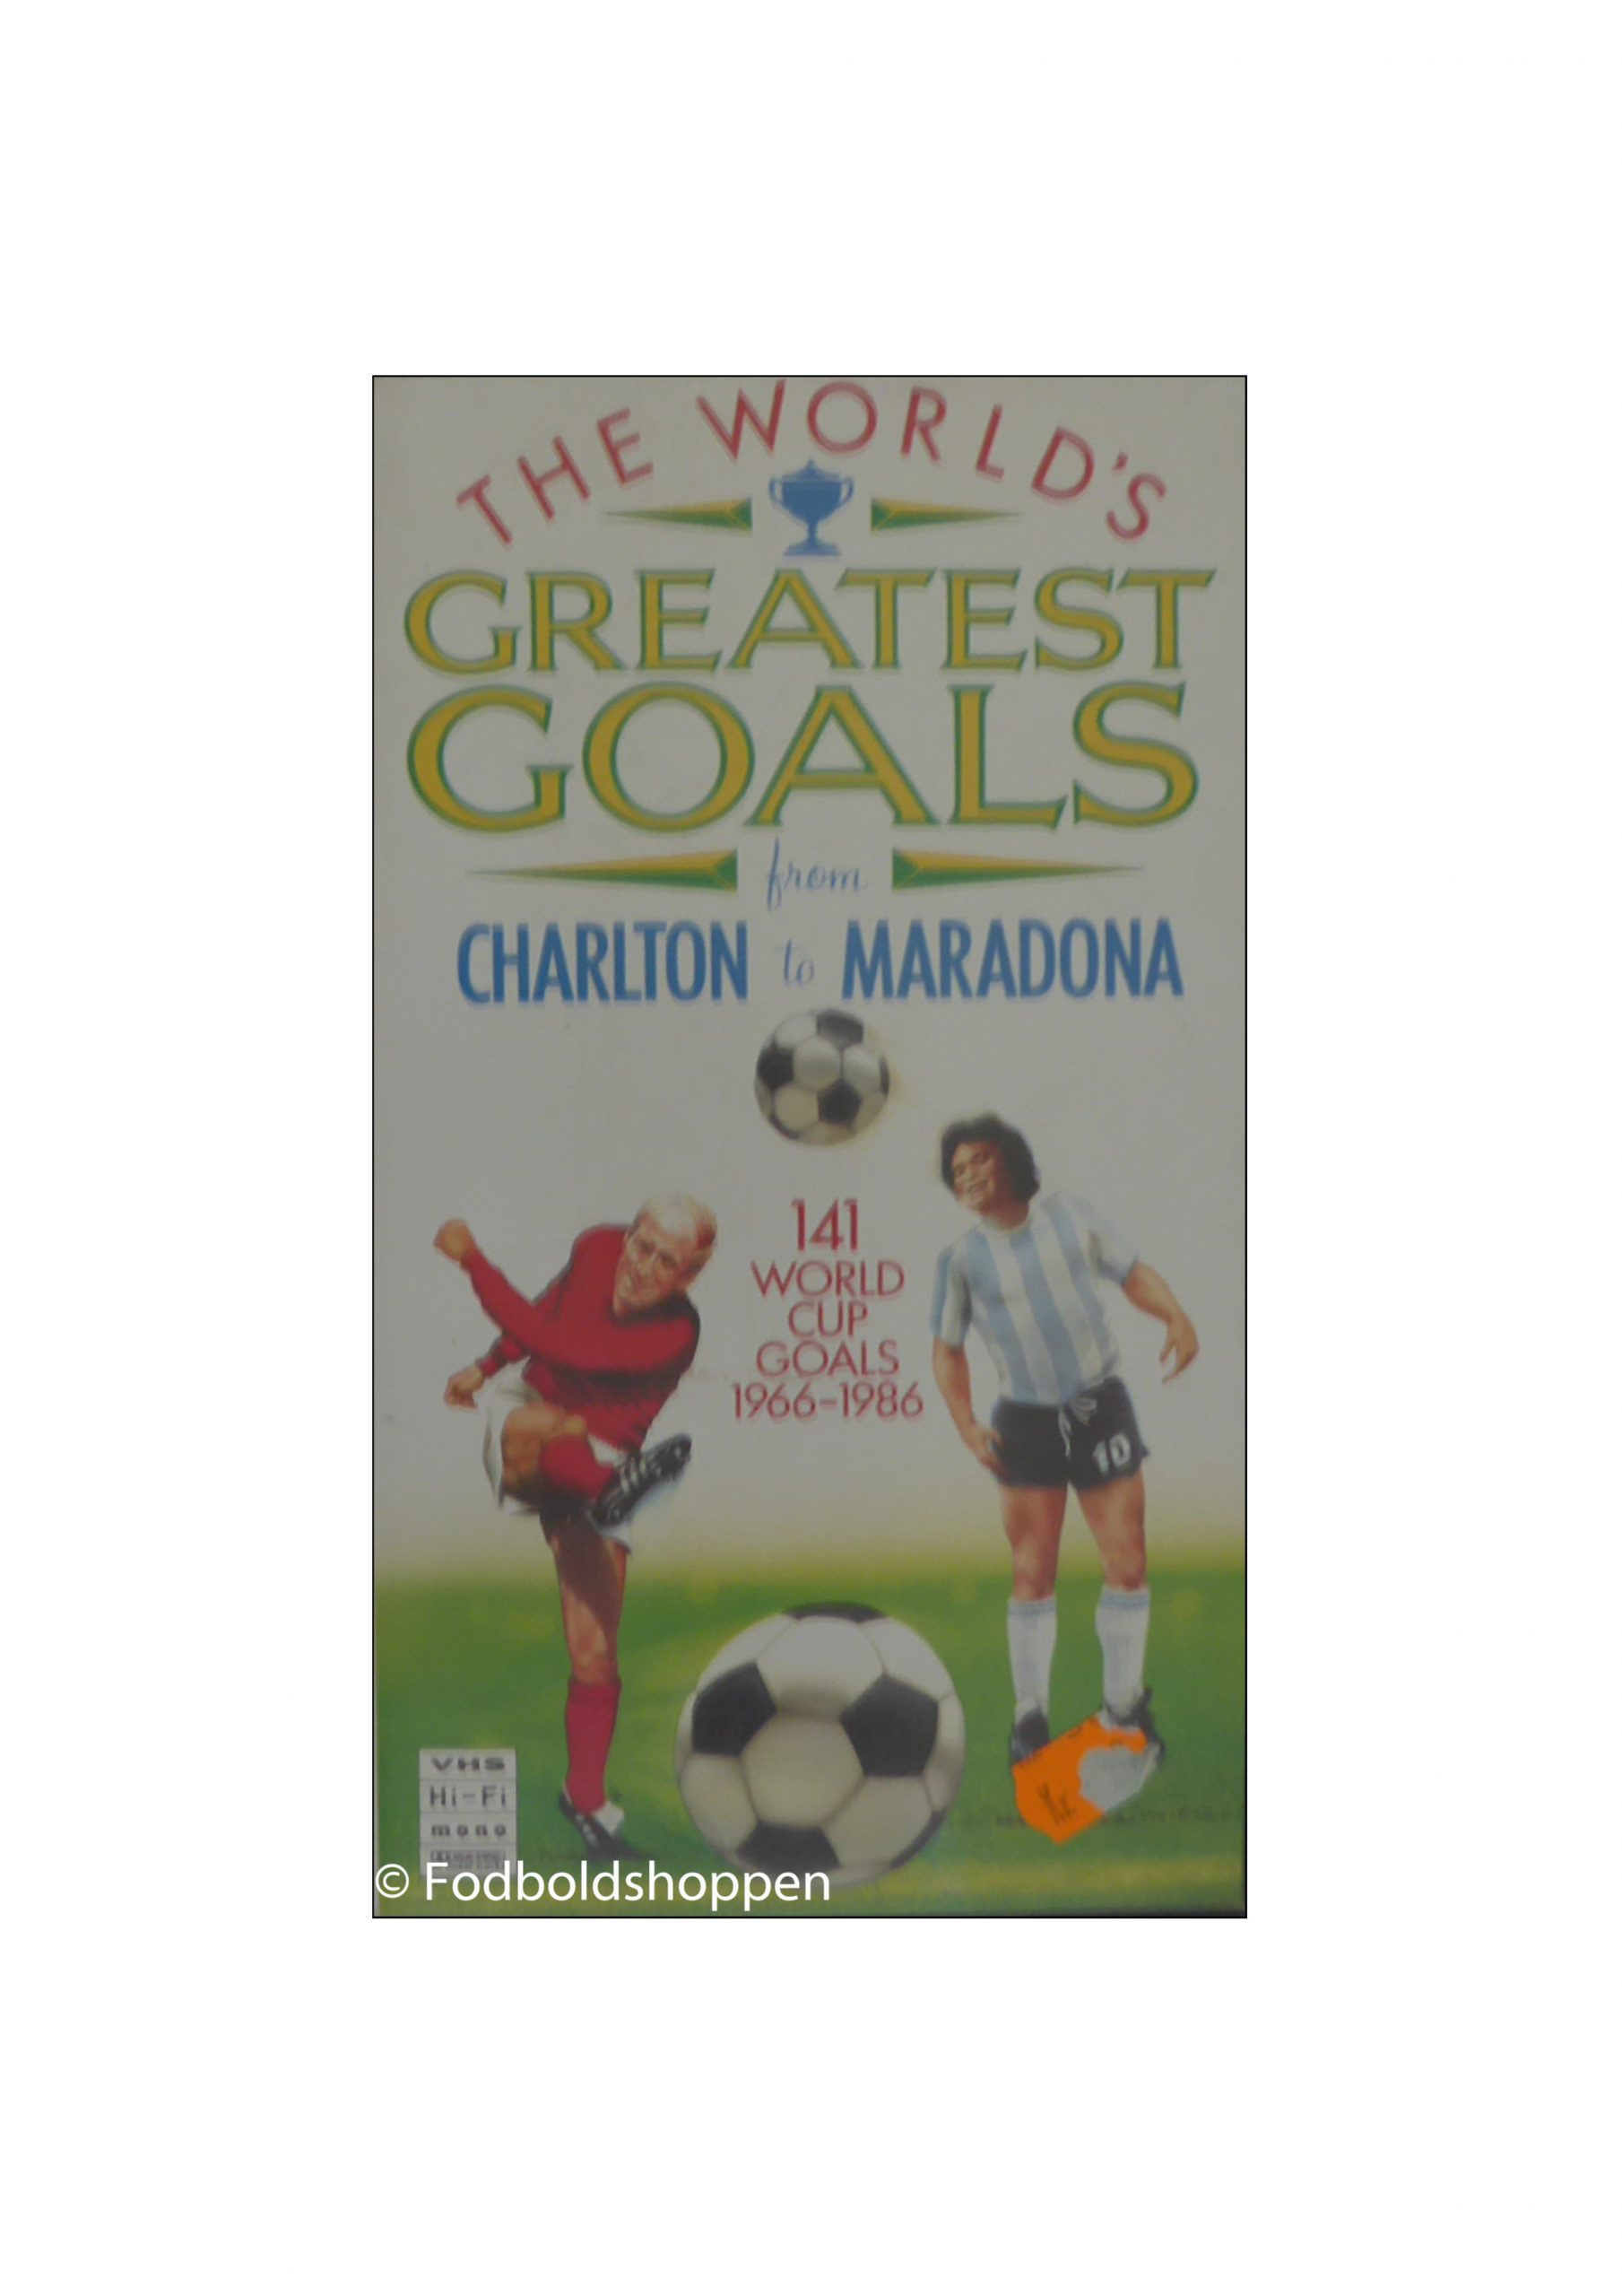 VHS - Greatest goals